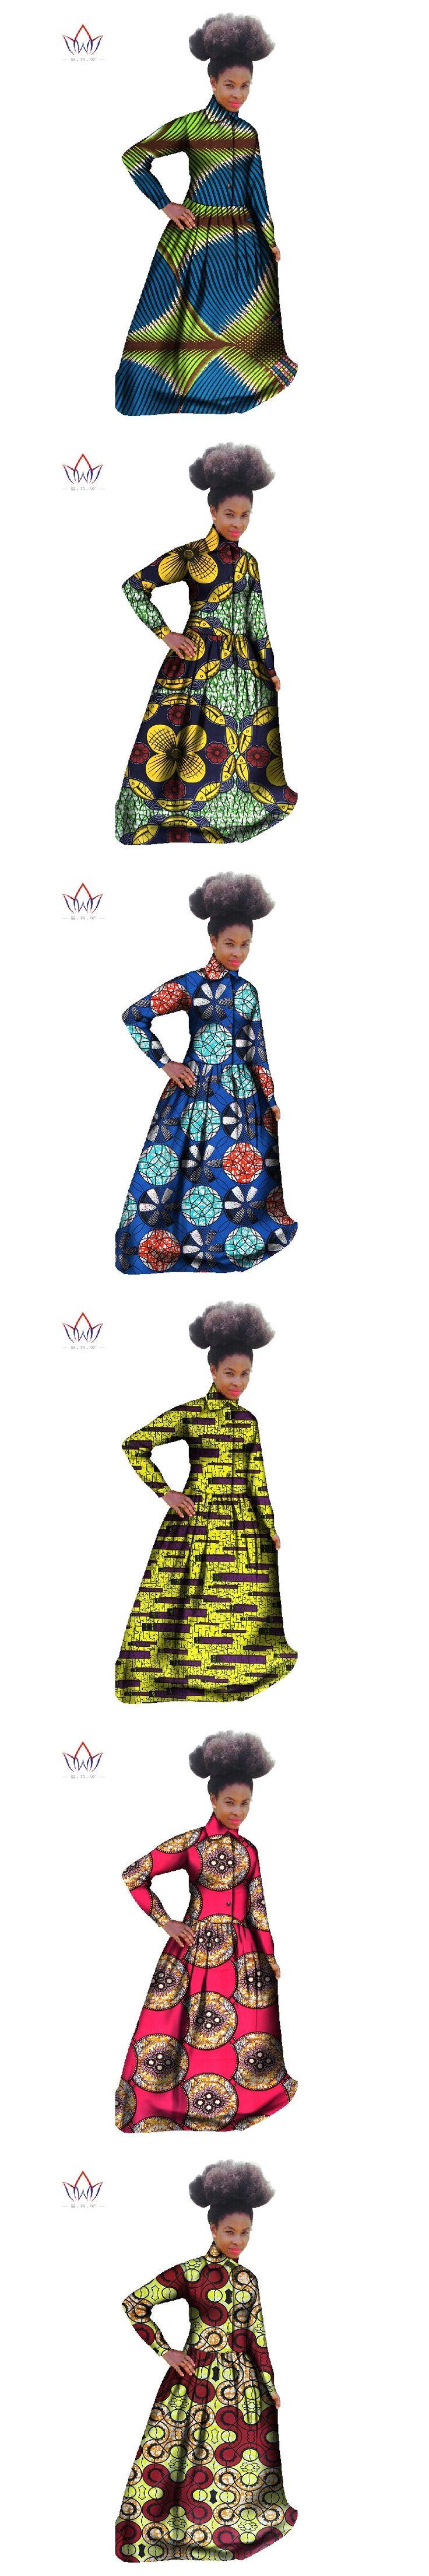 African Dress African Women Clothing Long Sleeve Maxi Dress Bazin Rich 6XL t Shirt Dress Dashiki Dresses African Clothing WY529